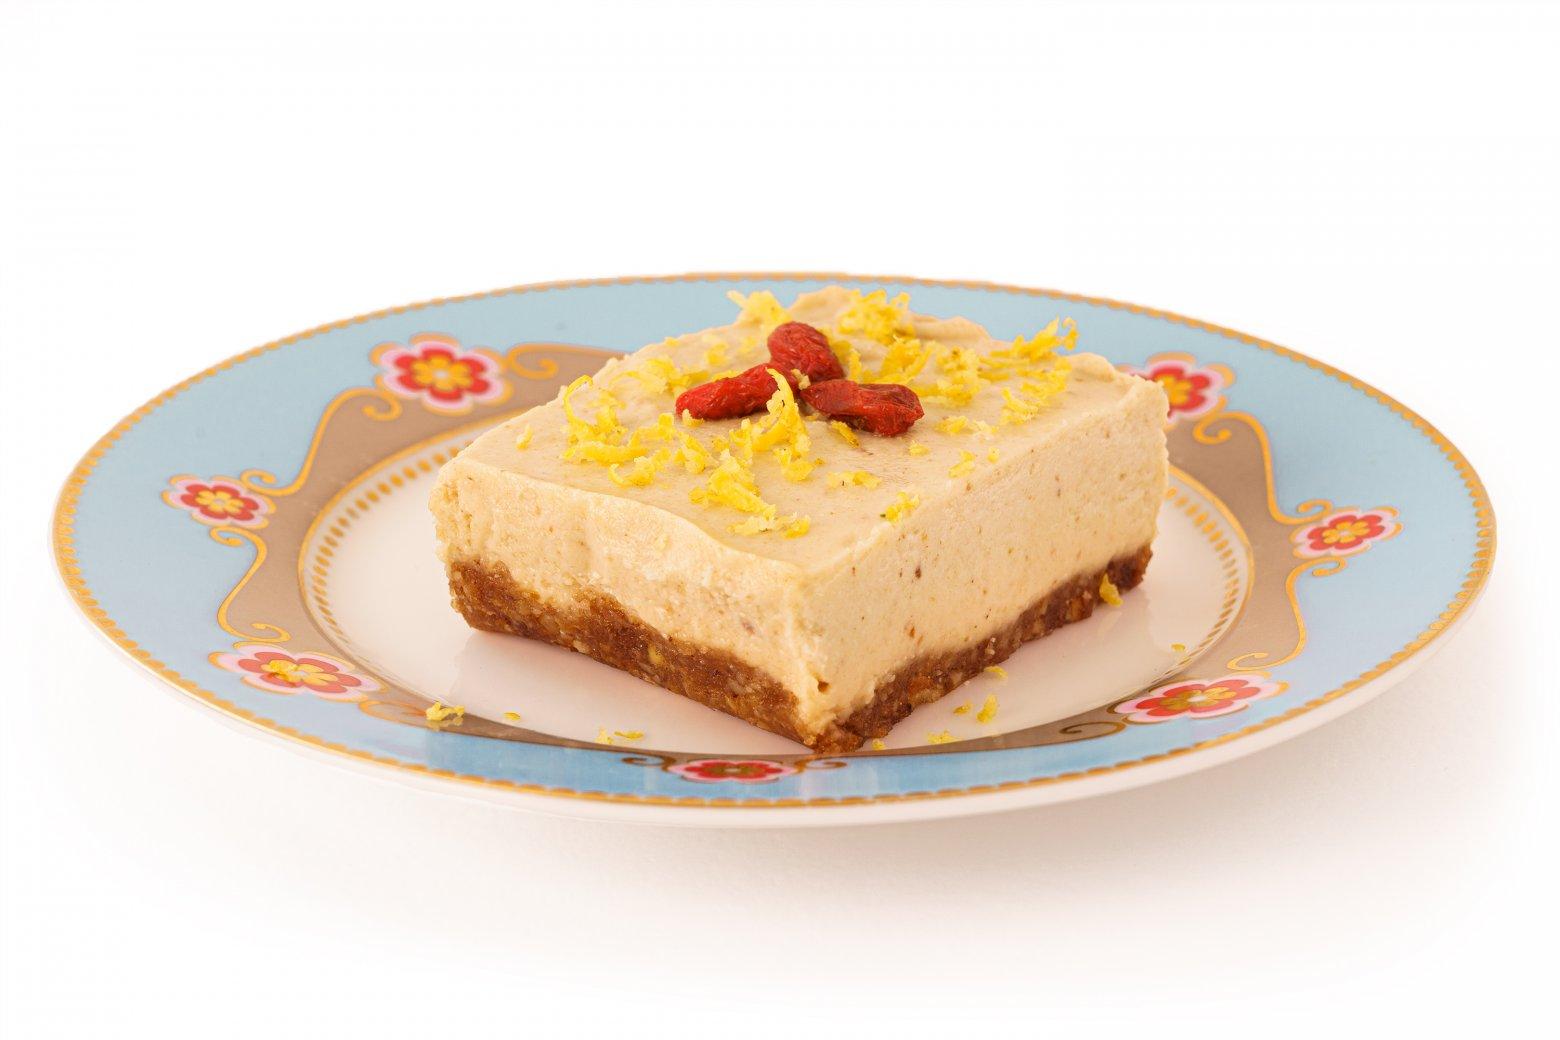 Lemon-Cheese Pie | Crudo